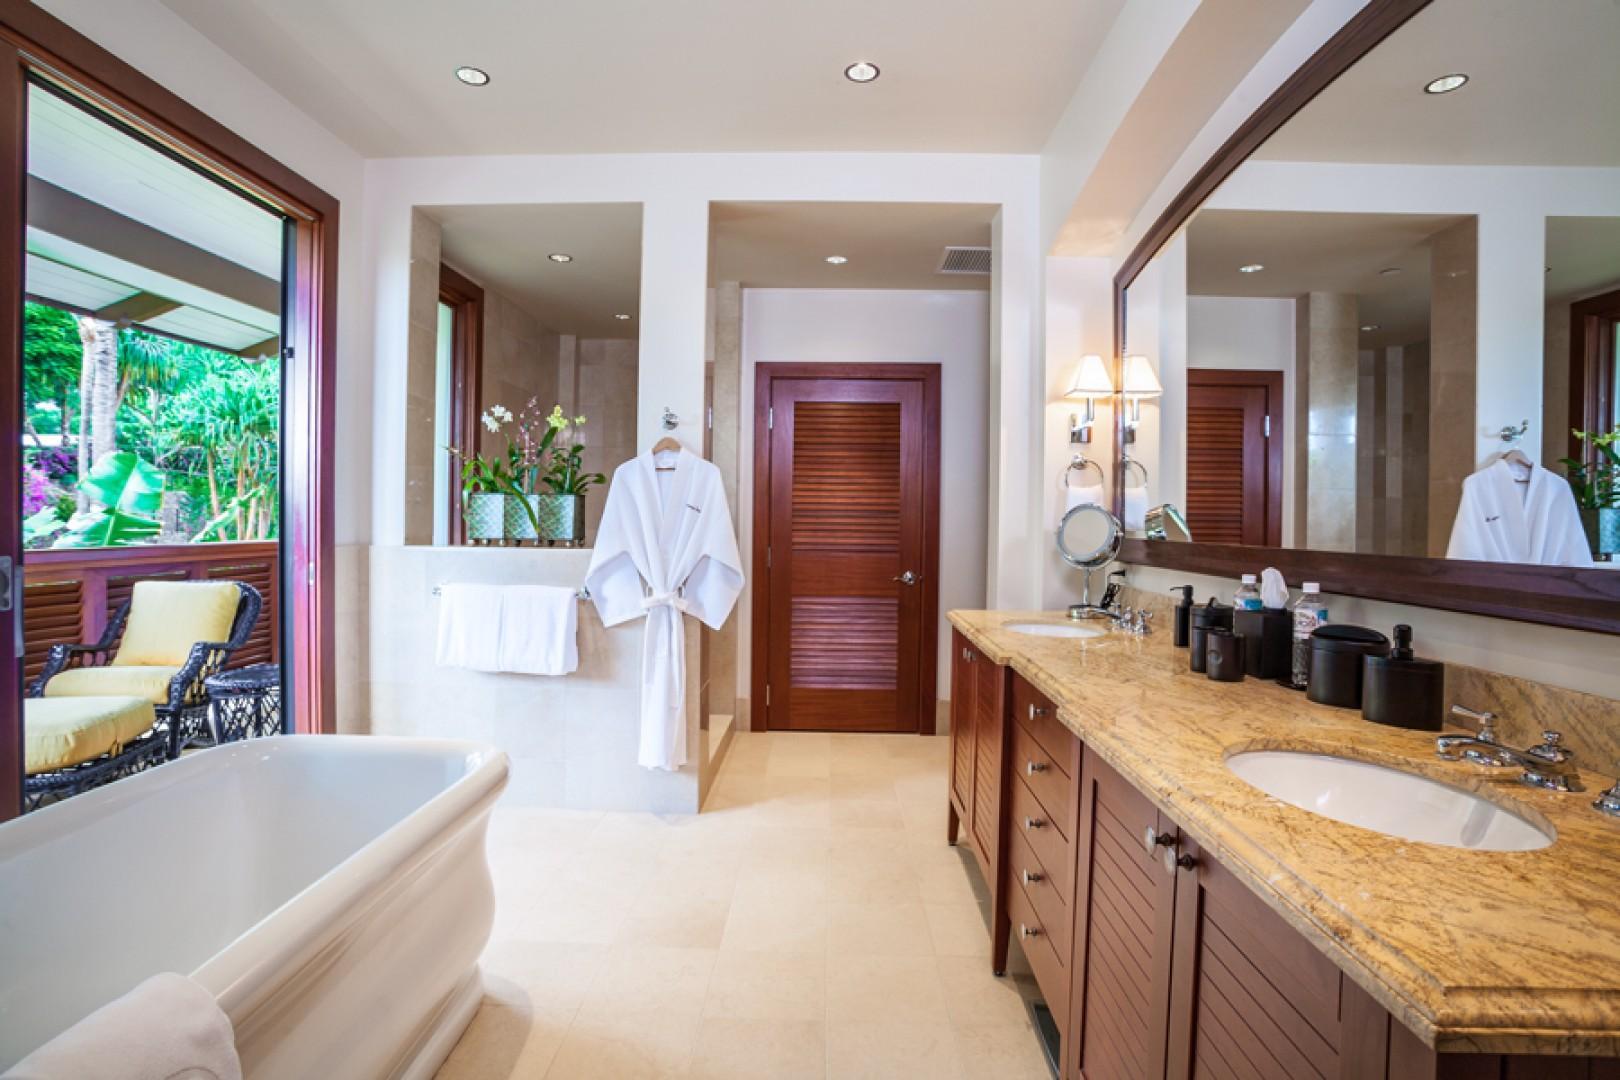 Castaway Cove C201 - Master Bedroom Bath with Private Garden Outdoor Terrace, Deep Soaking Tub, Separate Shower, Dual Vanities, Walk-In Closet, Safe